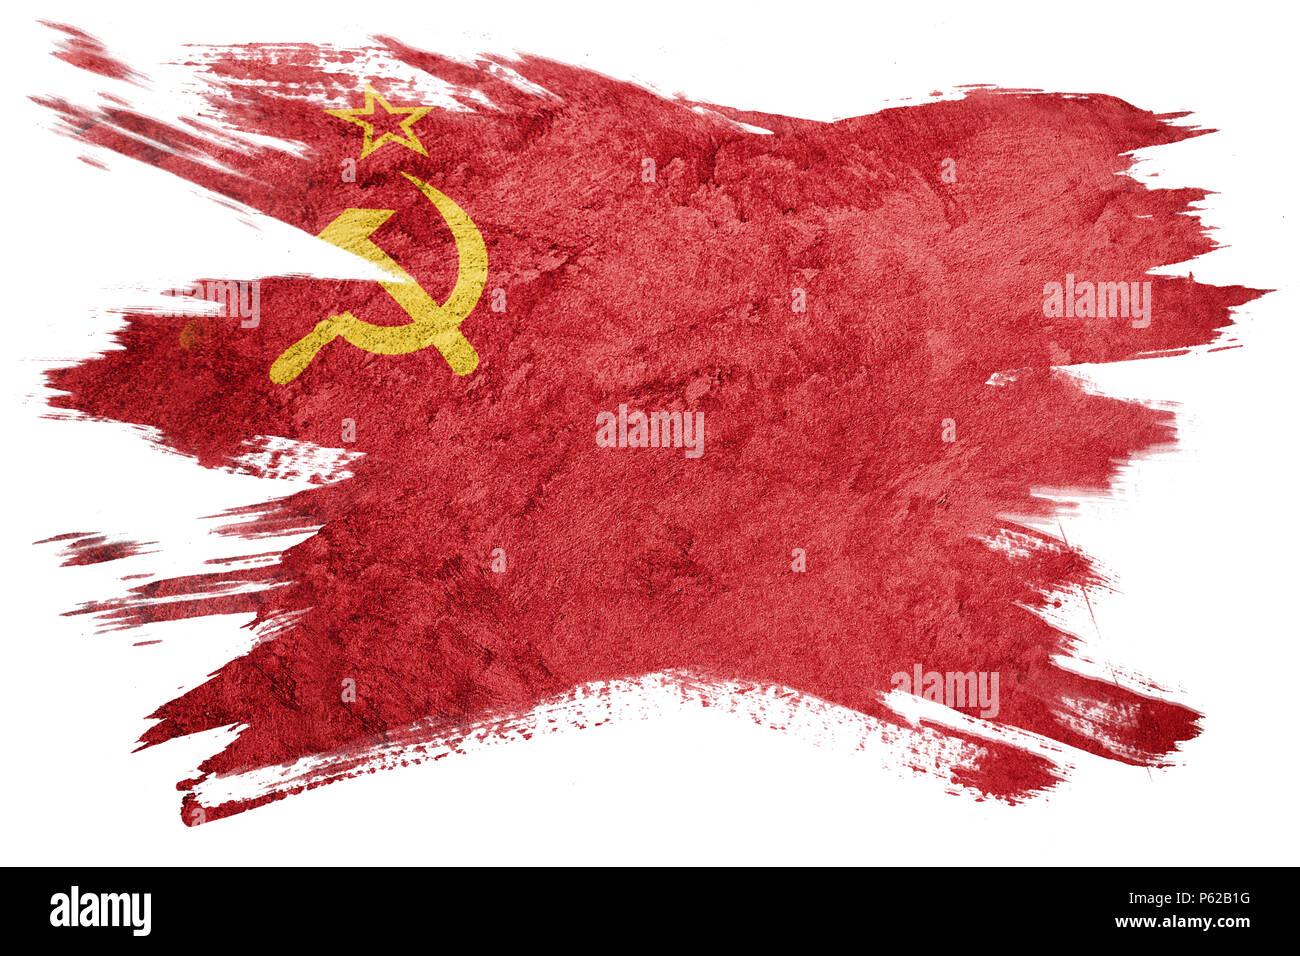 Grunge USSR flag. Soviet Union flag with grunge texture. Brush stroke. - Stock Image